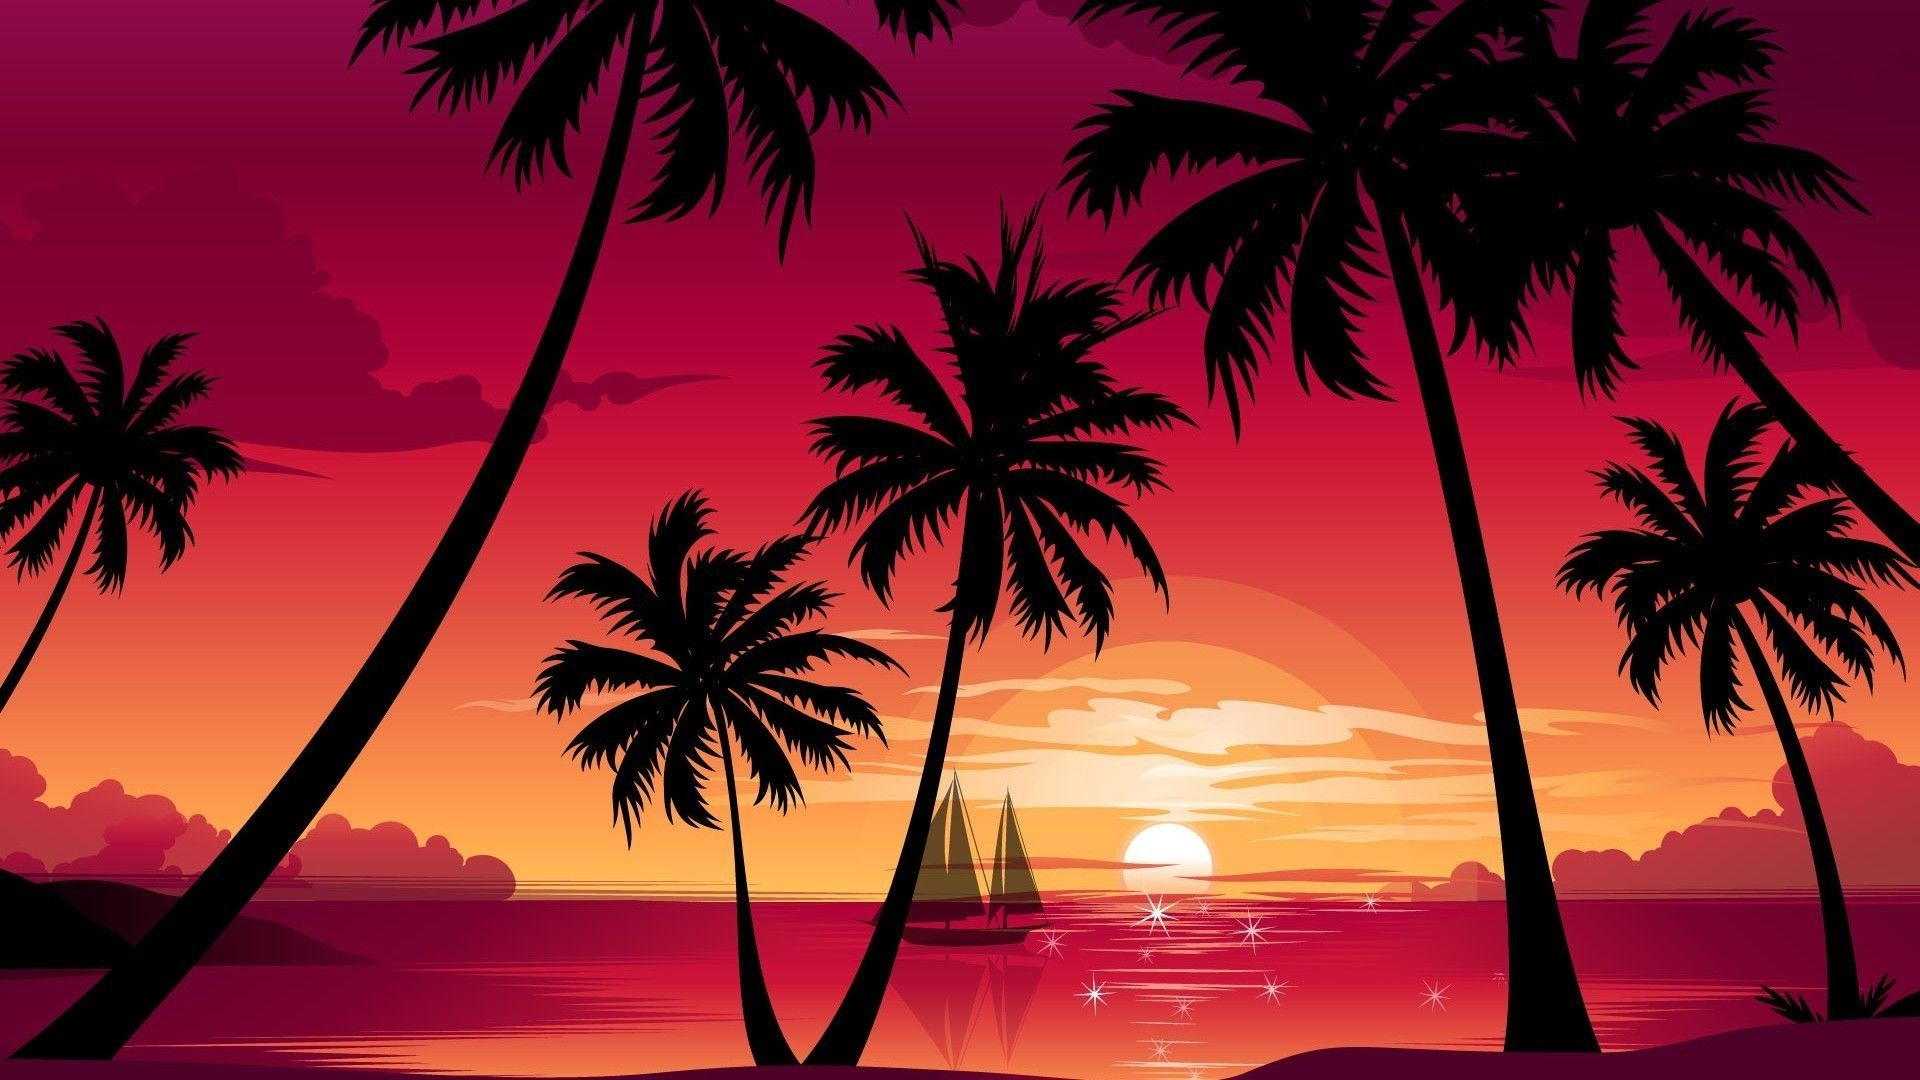 Palm Tree Sunset wallpaper for laptop